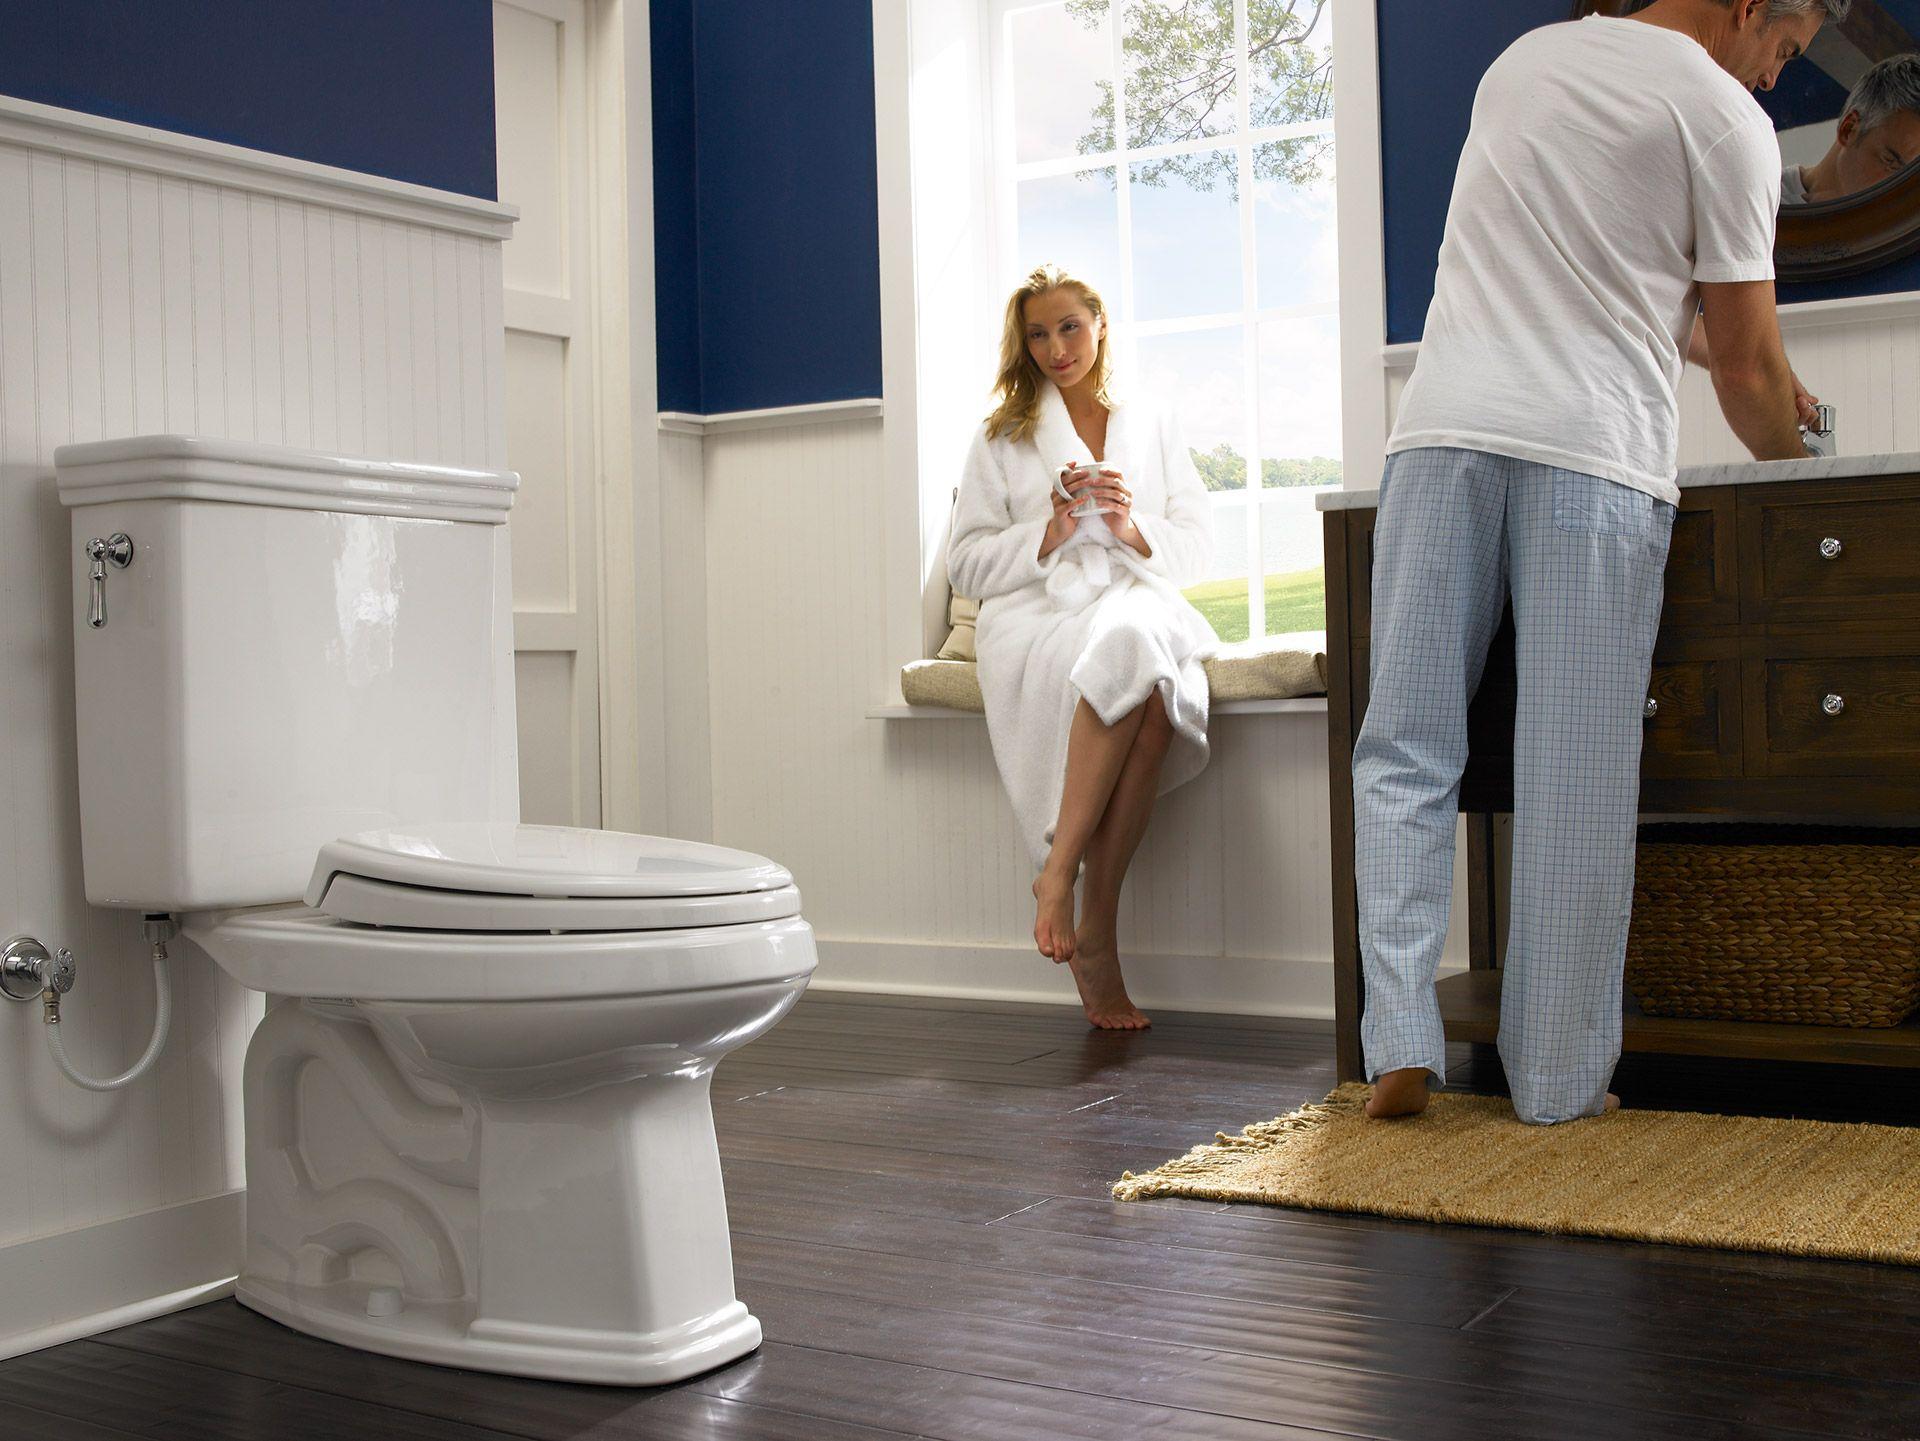 Promenade® Two-Piece Toilet, 1.6 GPF, Elongated Bowl - TotoUSA.com